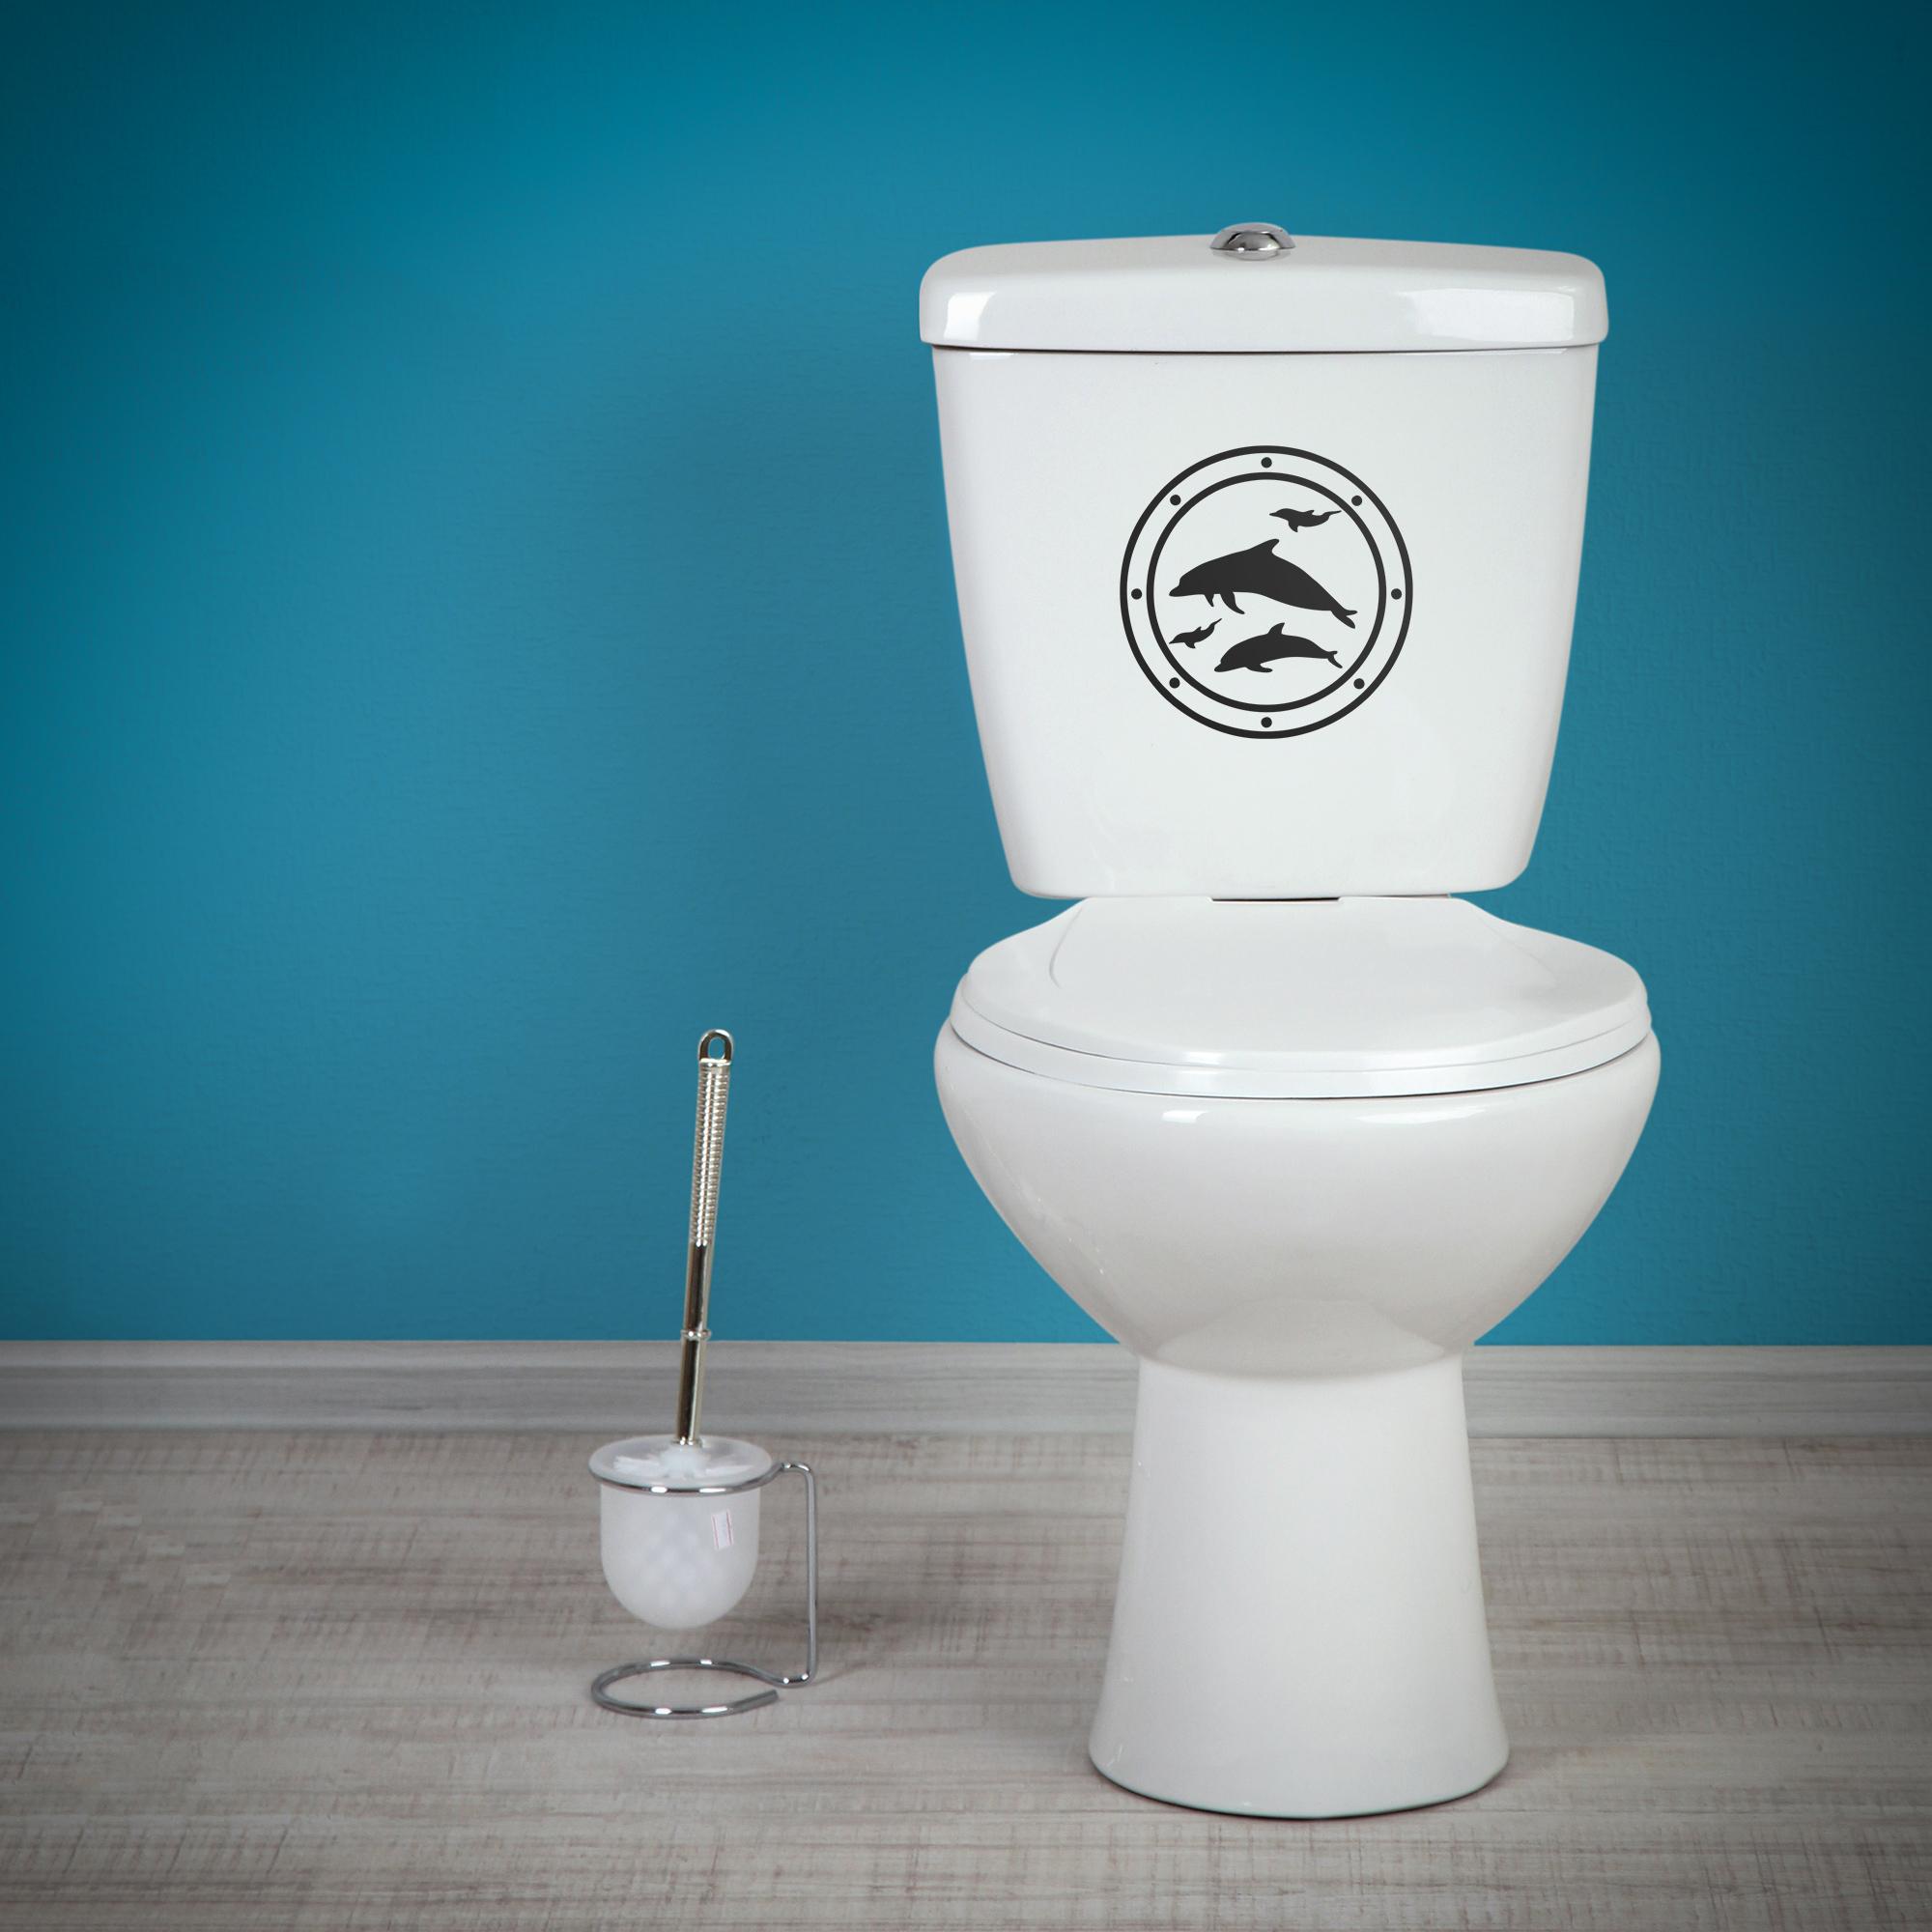 Samolepka na WC - Okno - PopyDesign